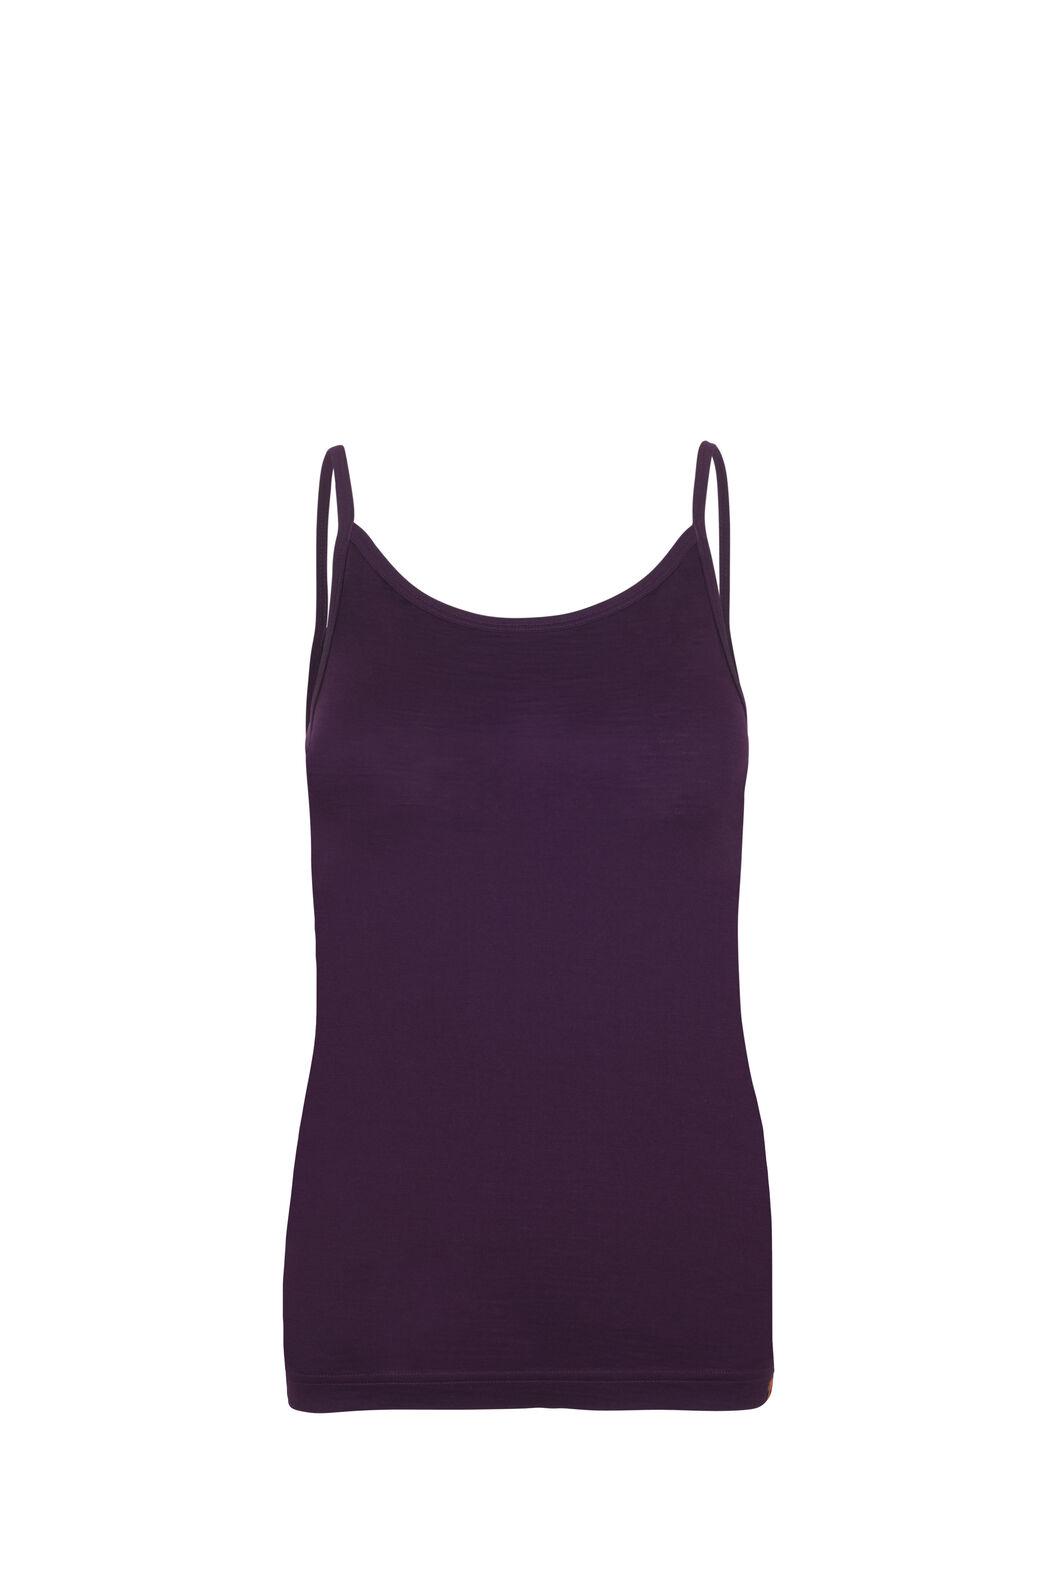 Macpac 150 Merino Camisole - Women's, Potent Purple, hi-res